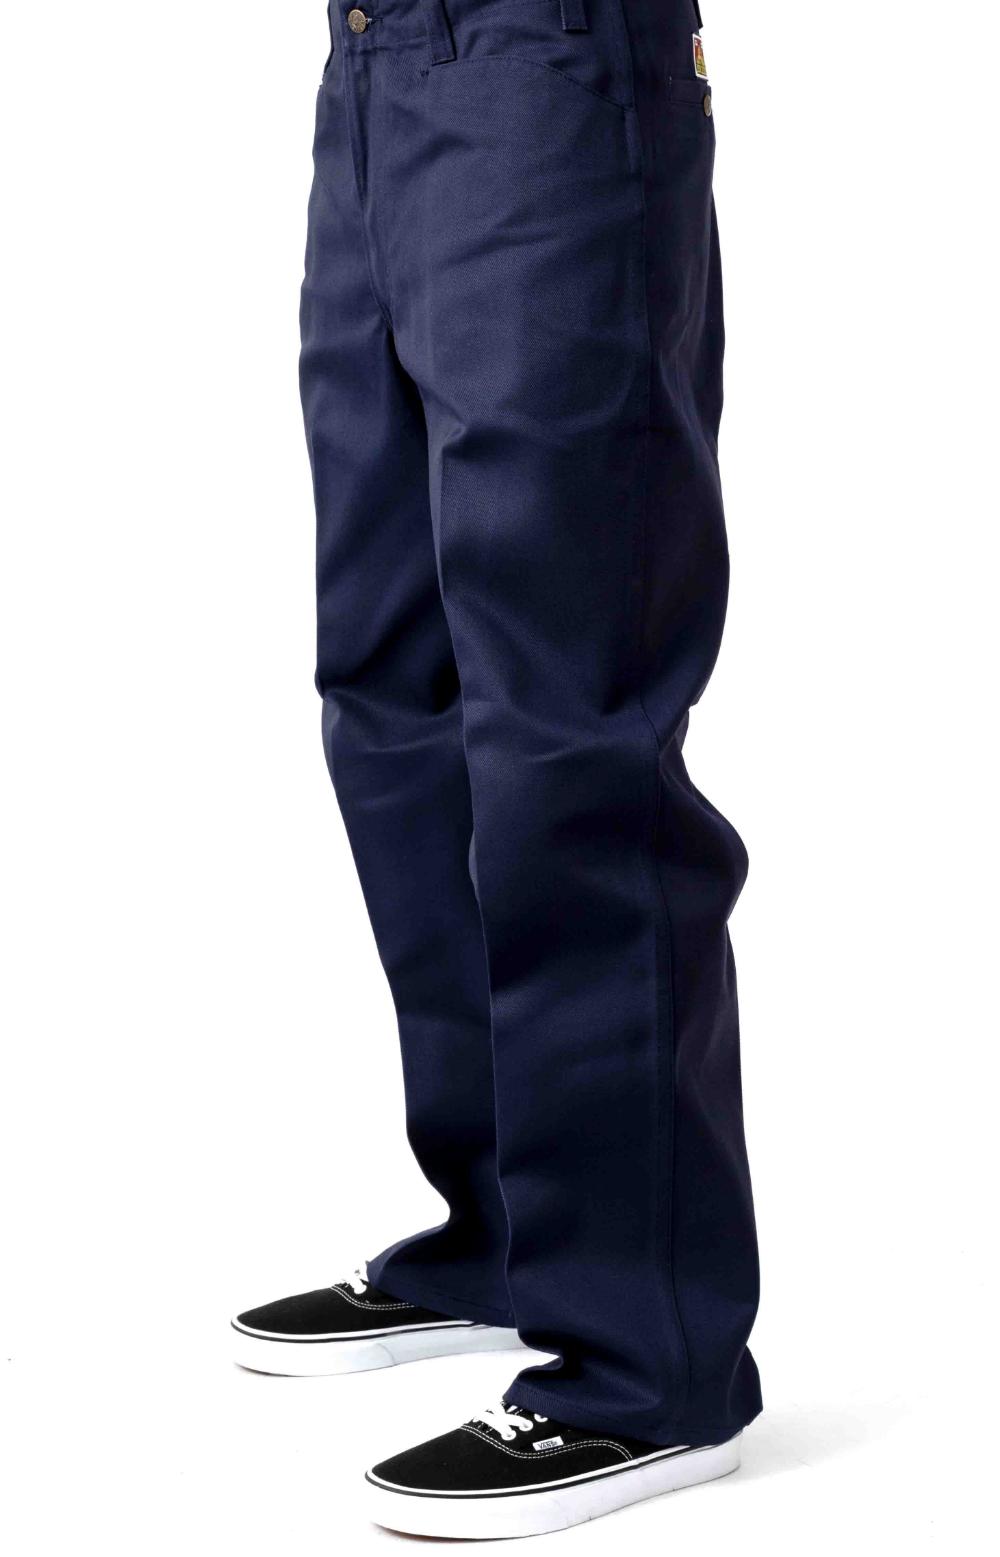 Ben Davis Original Ben S Pants Navy Mltd Pants Outfit Men Pants Mens Street Style